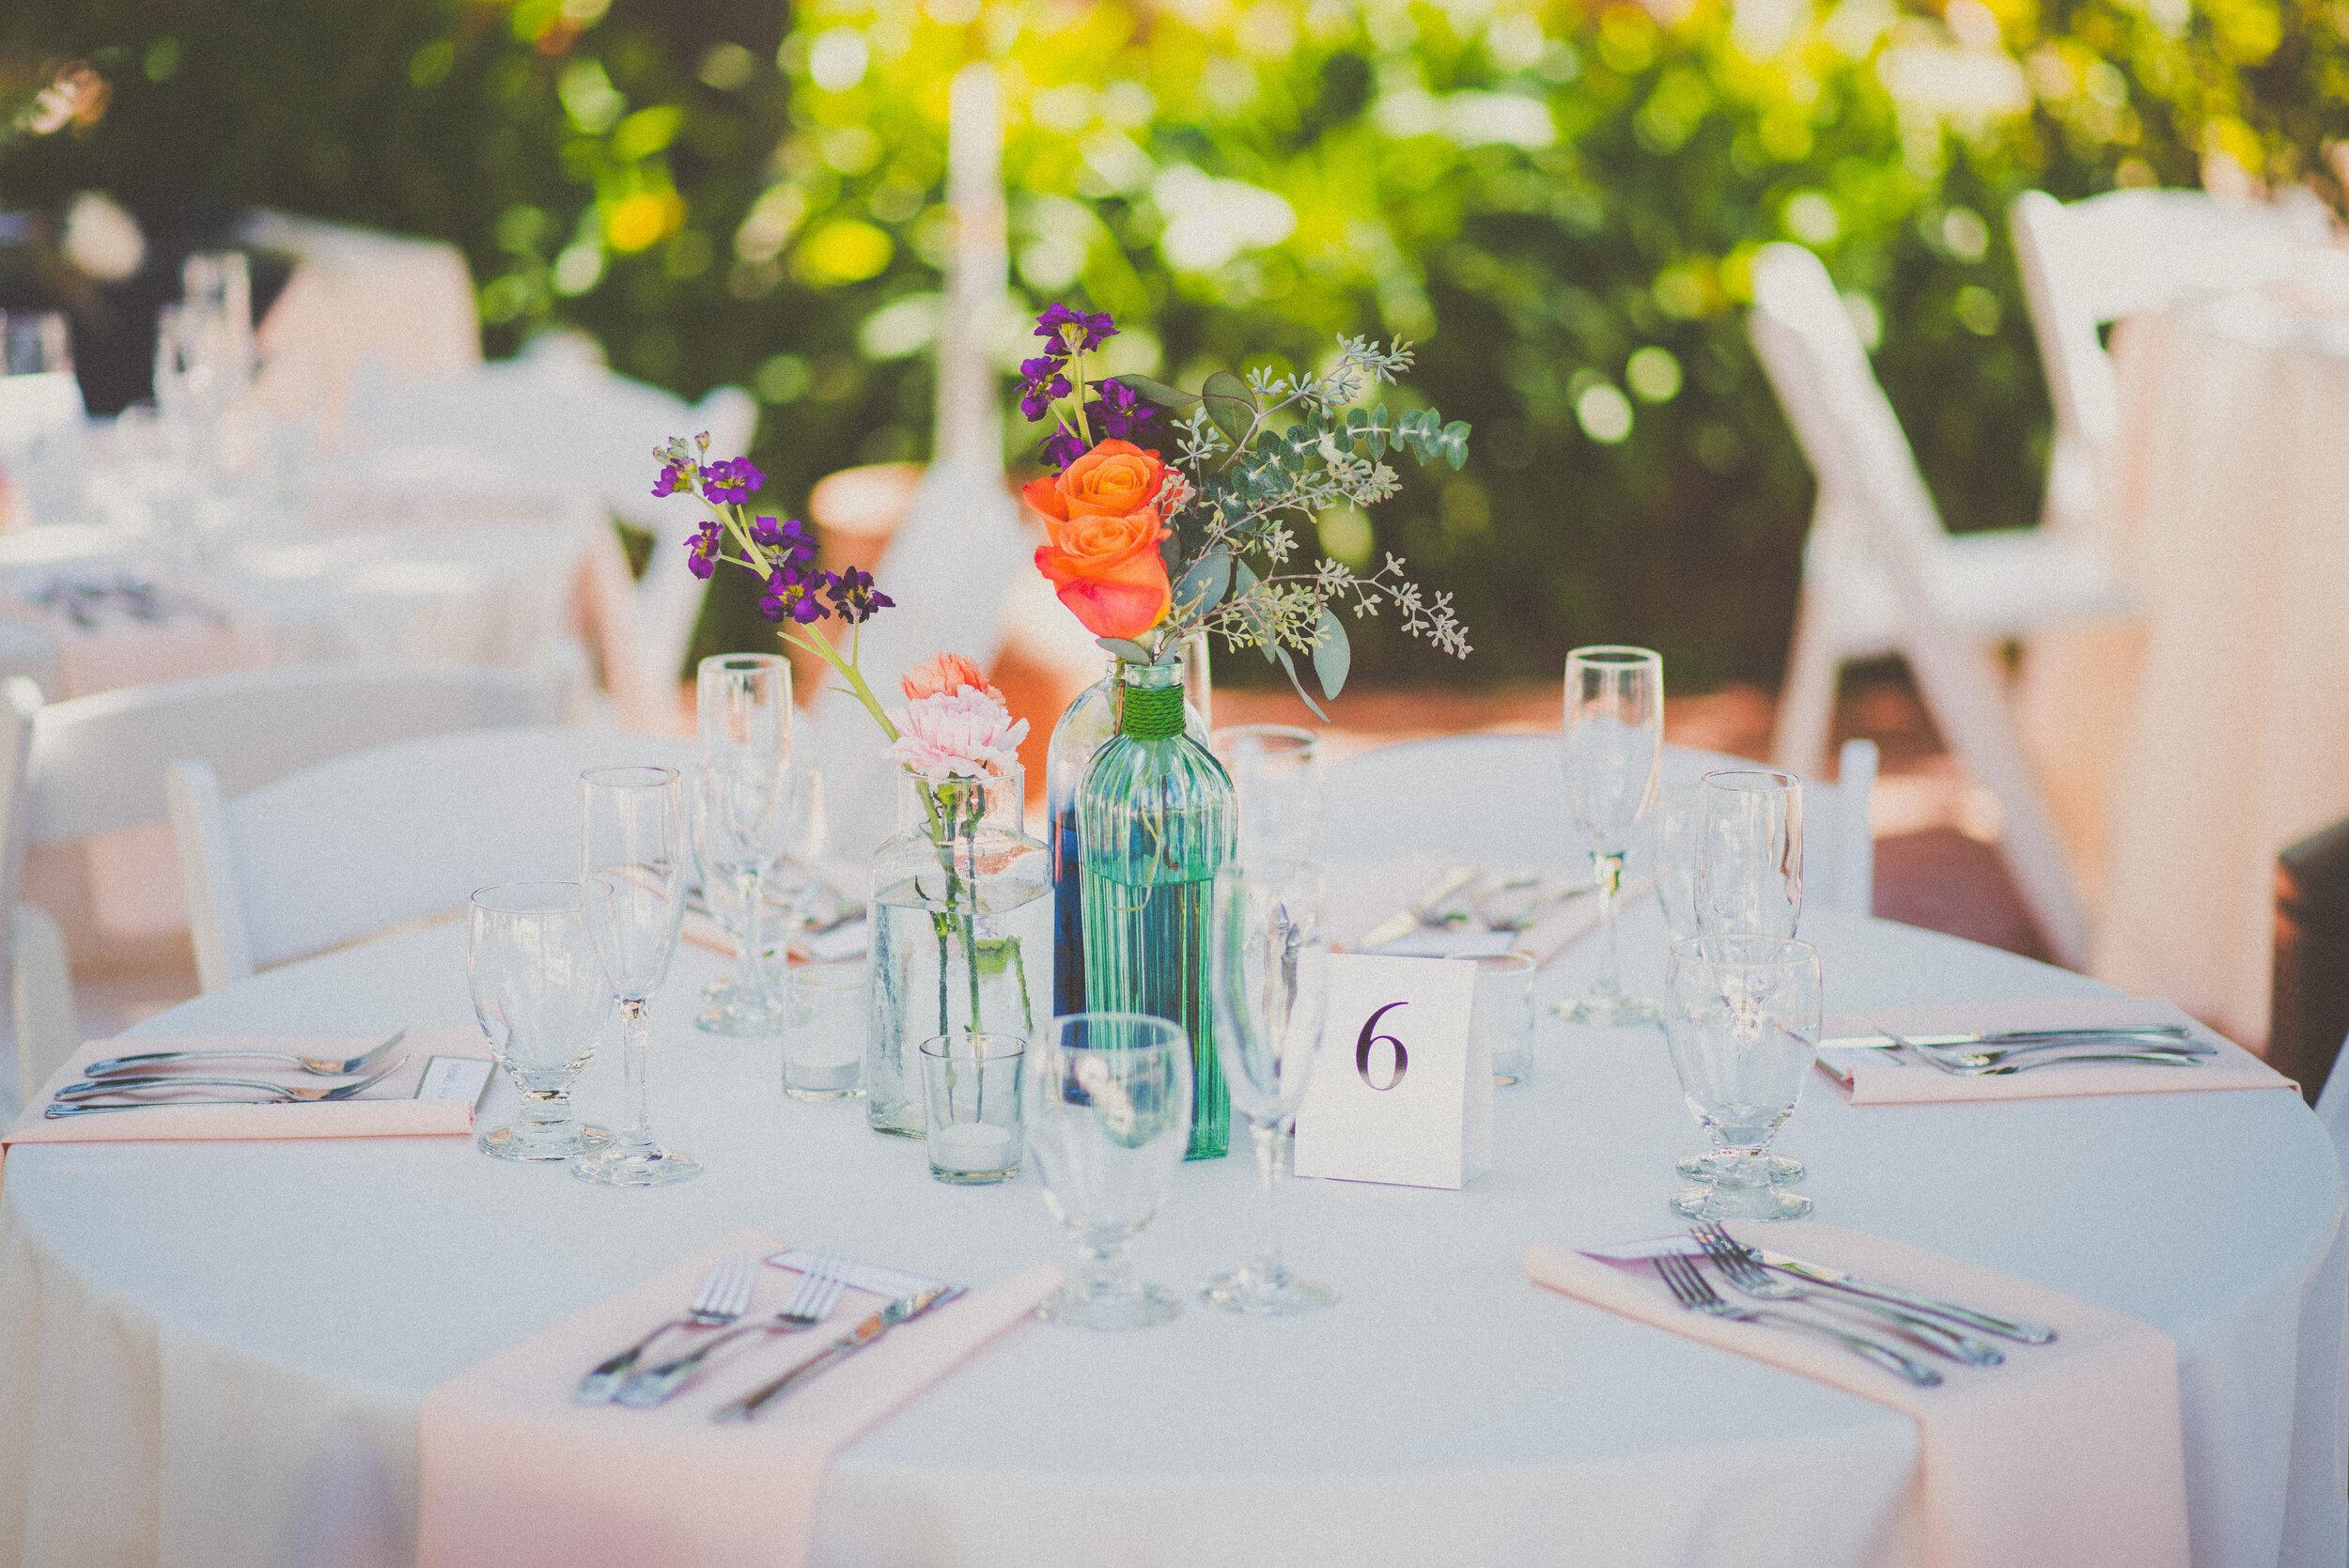 Herrera Wedding - Reception-25.jpg